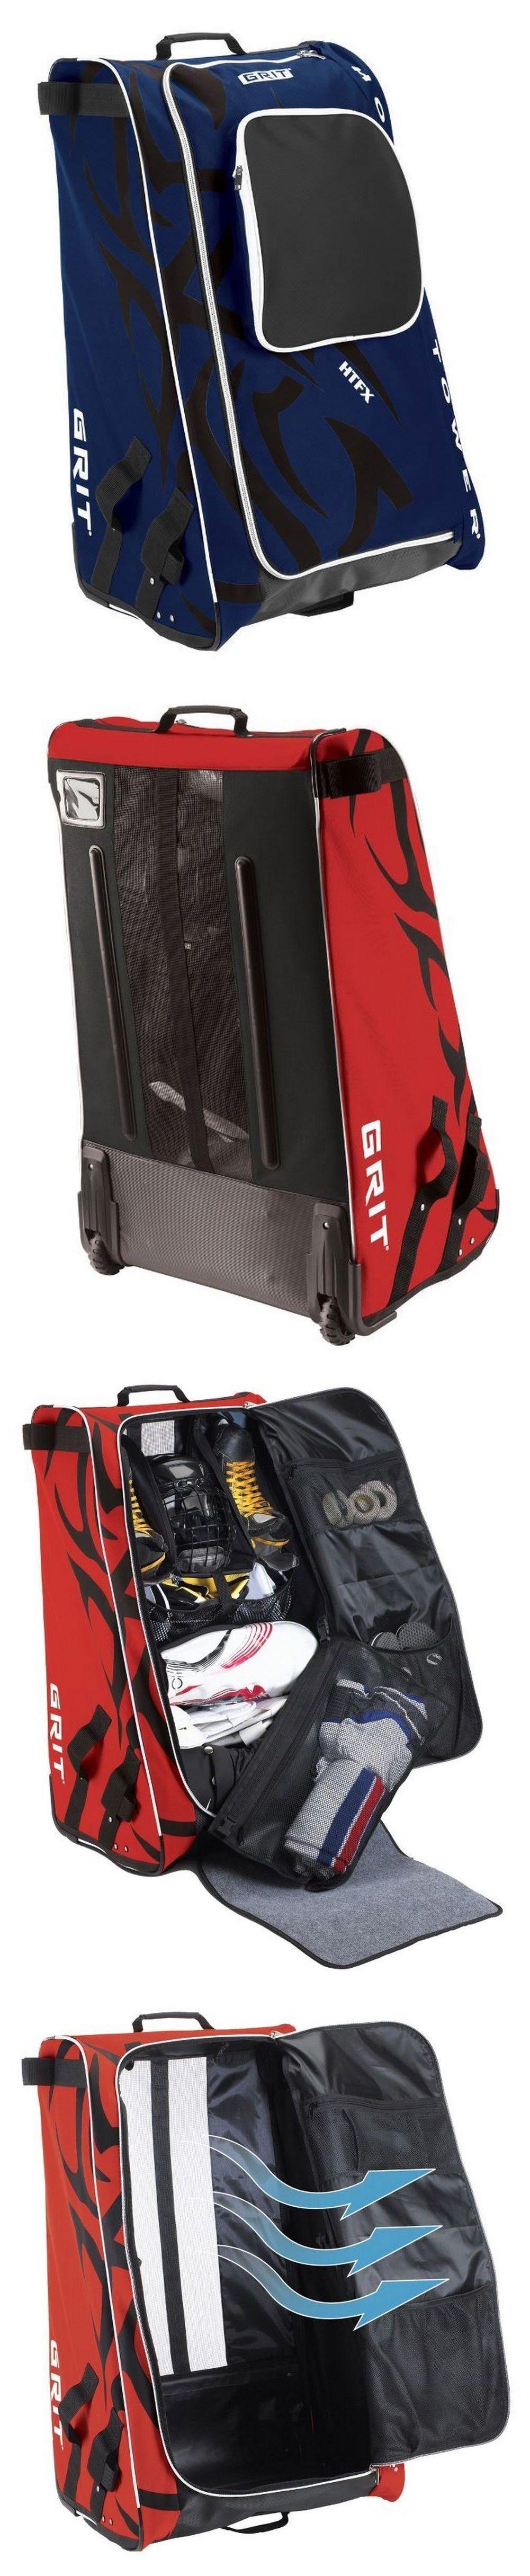 3de93eada23 Equipment Bags 58113  Grit Htfx Hockey Tower 36 Inch Wheeled Equipment Bag  Navy New -